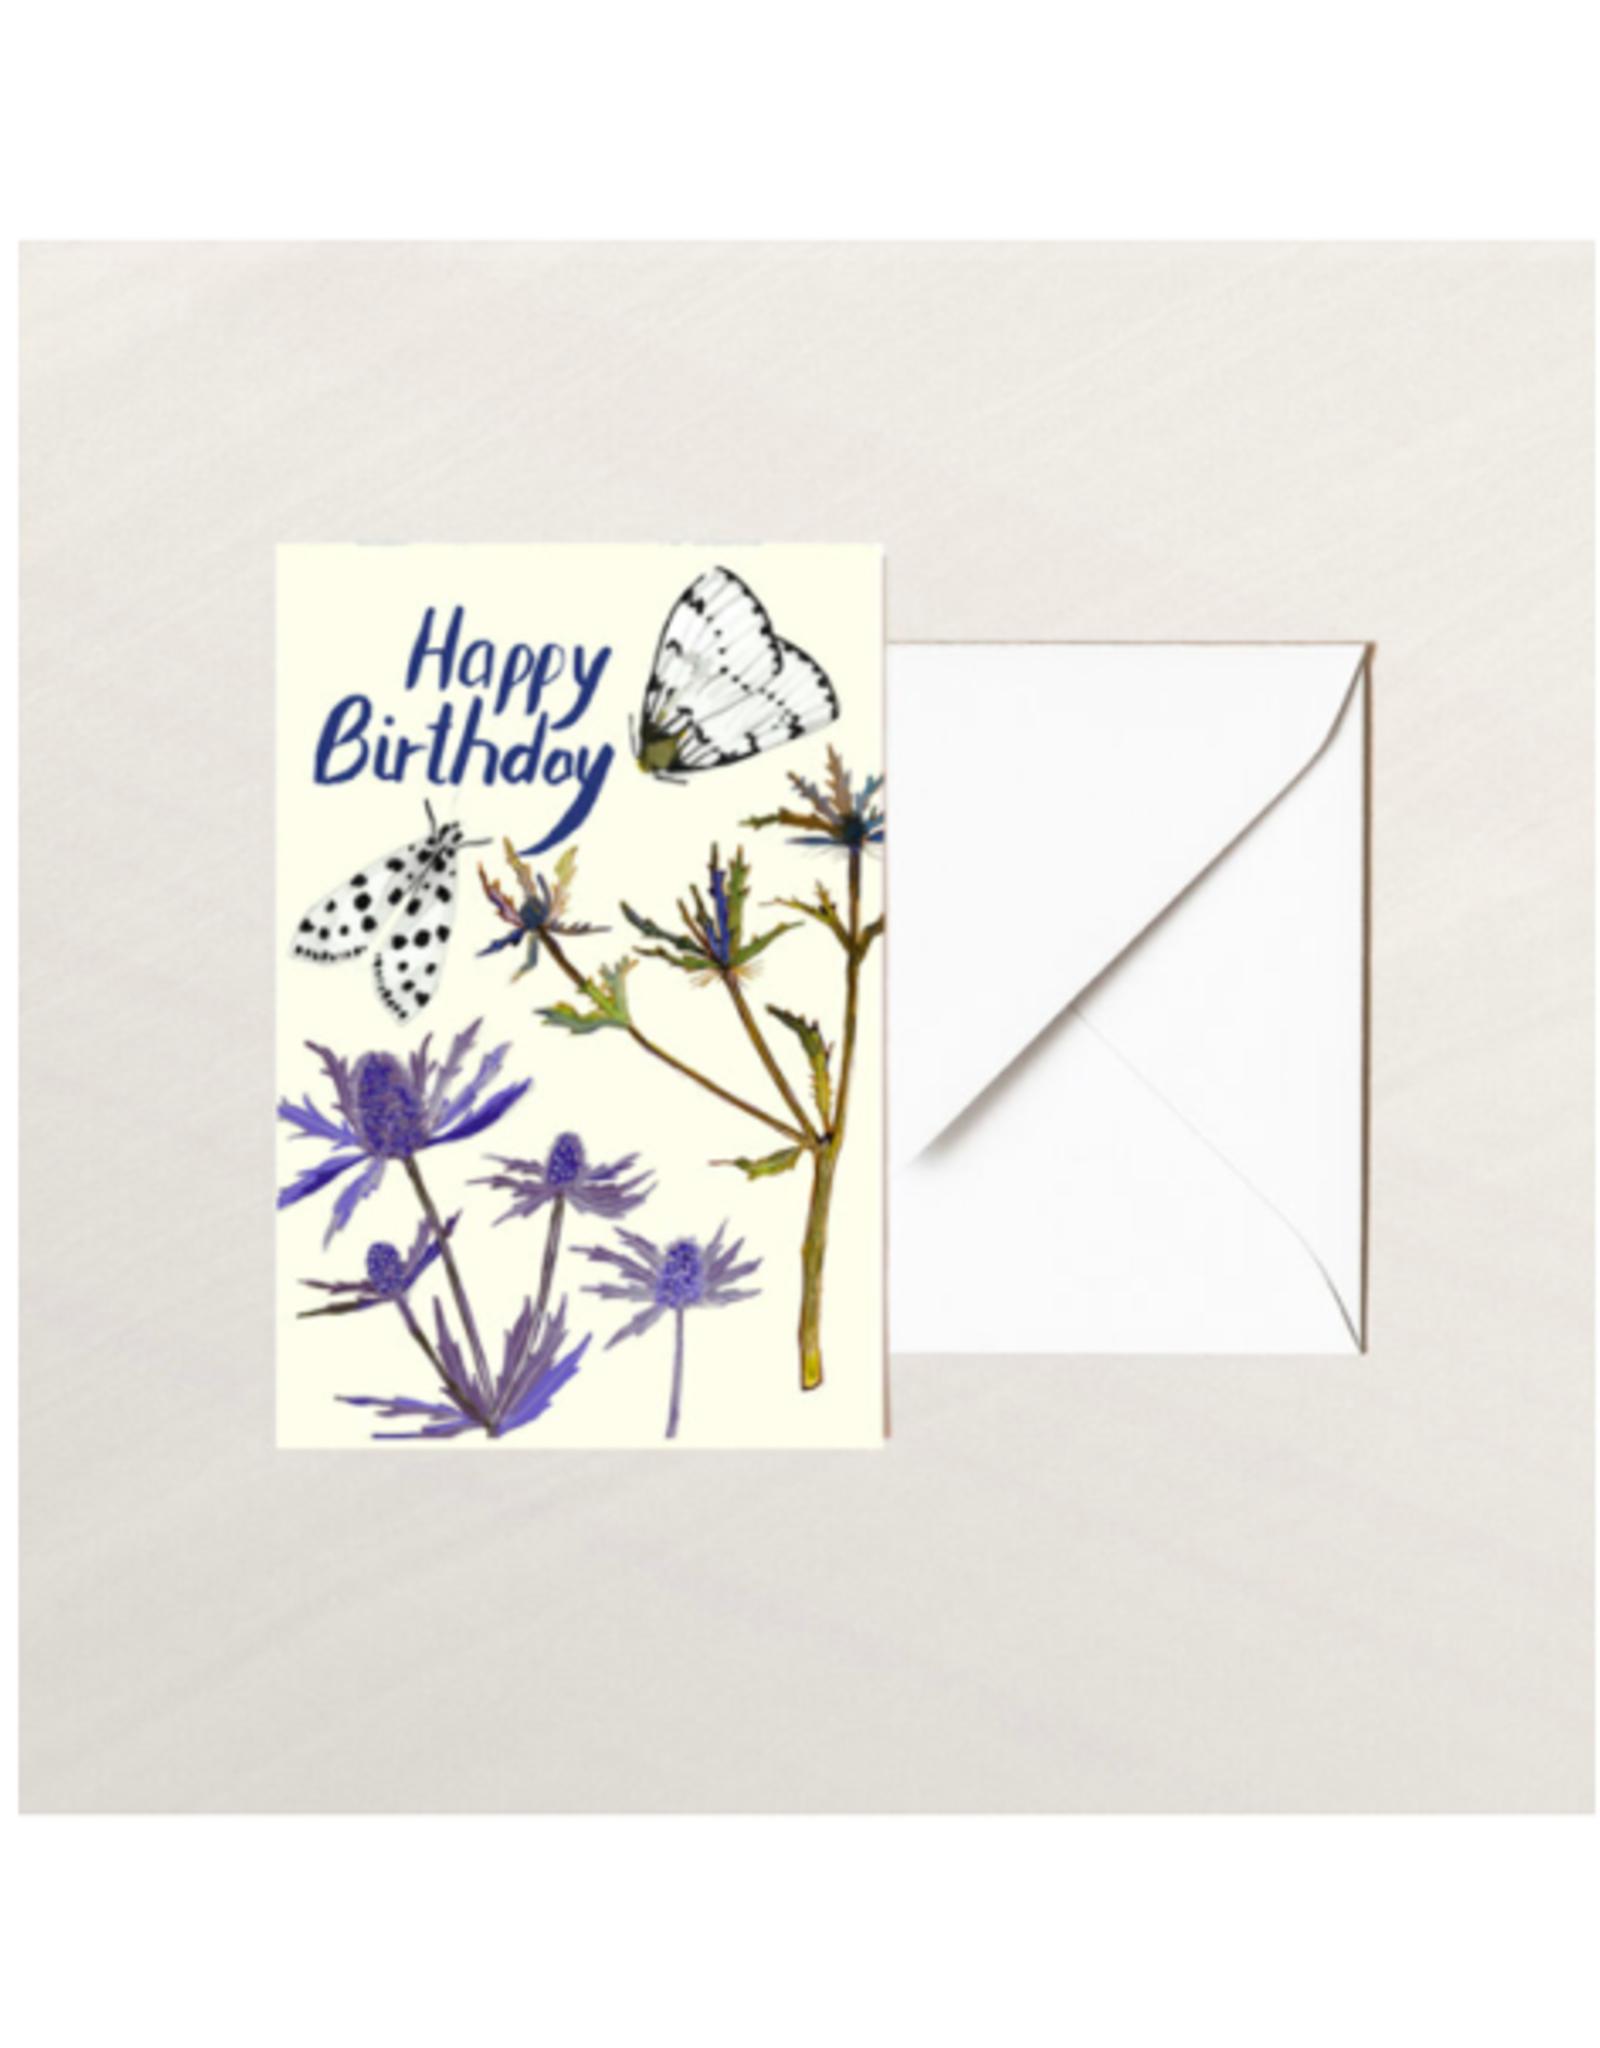 Briana Corr Scott - Card/Moths, Happy Birthday